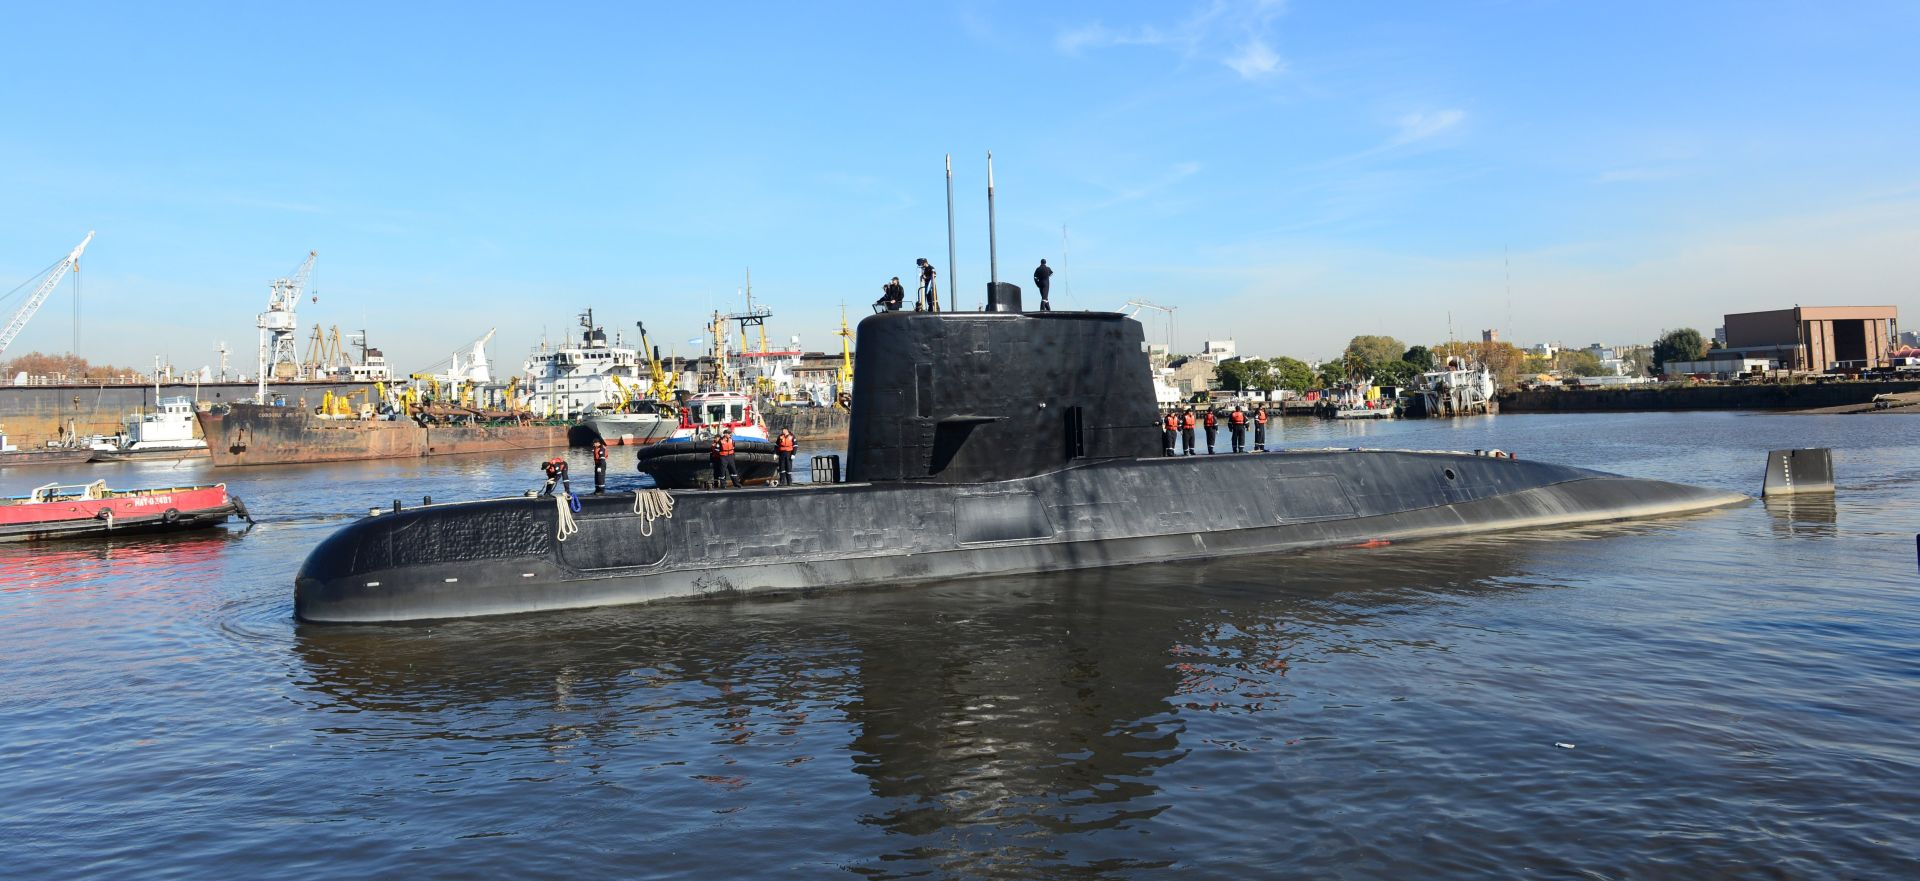 Obustavljena potraga za nestalom argentinskom podmornicom